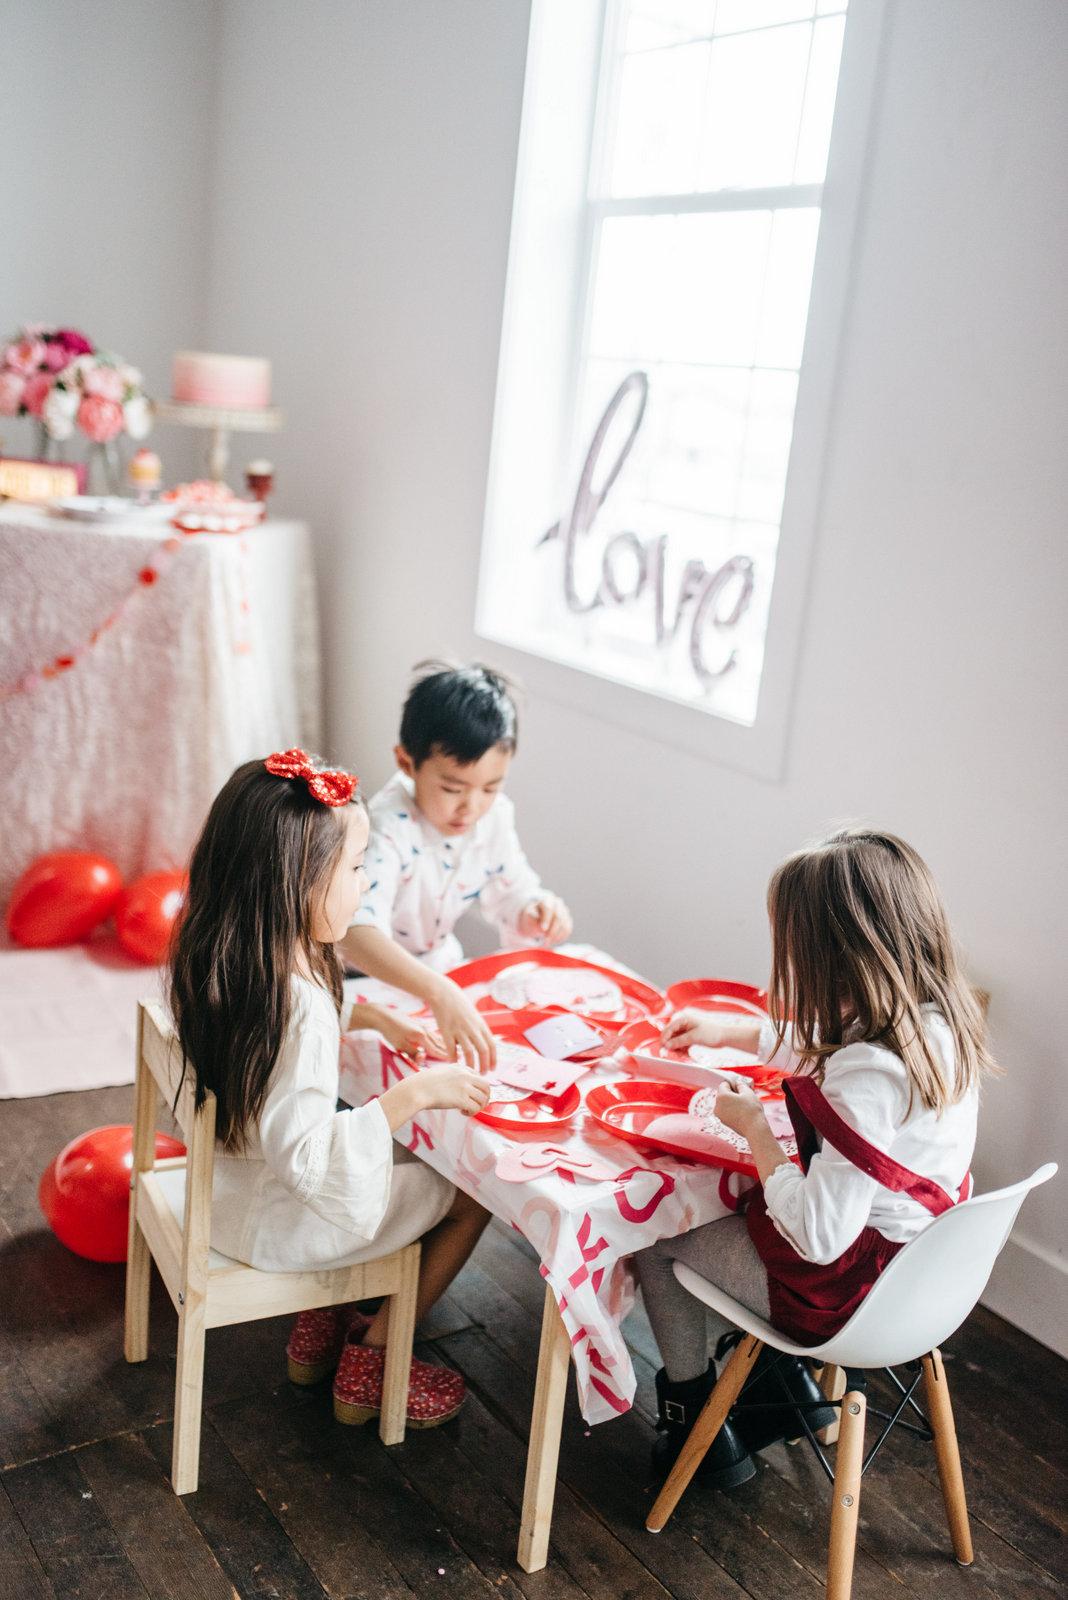 Family Valentine's Day Ideas: Valentine's Crafts for Kids